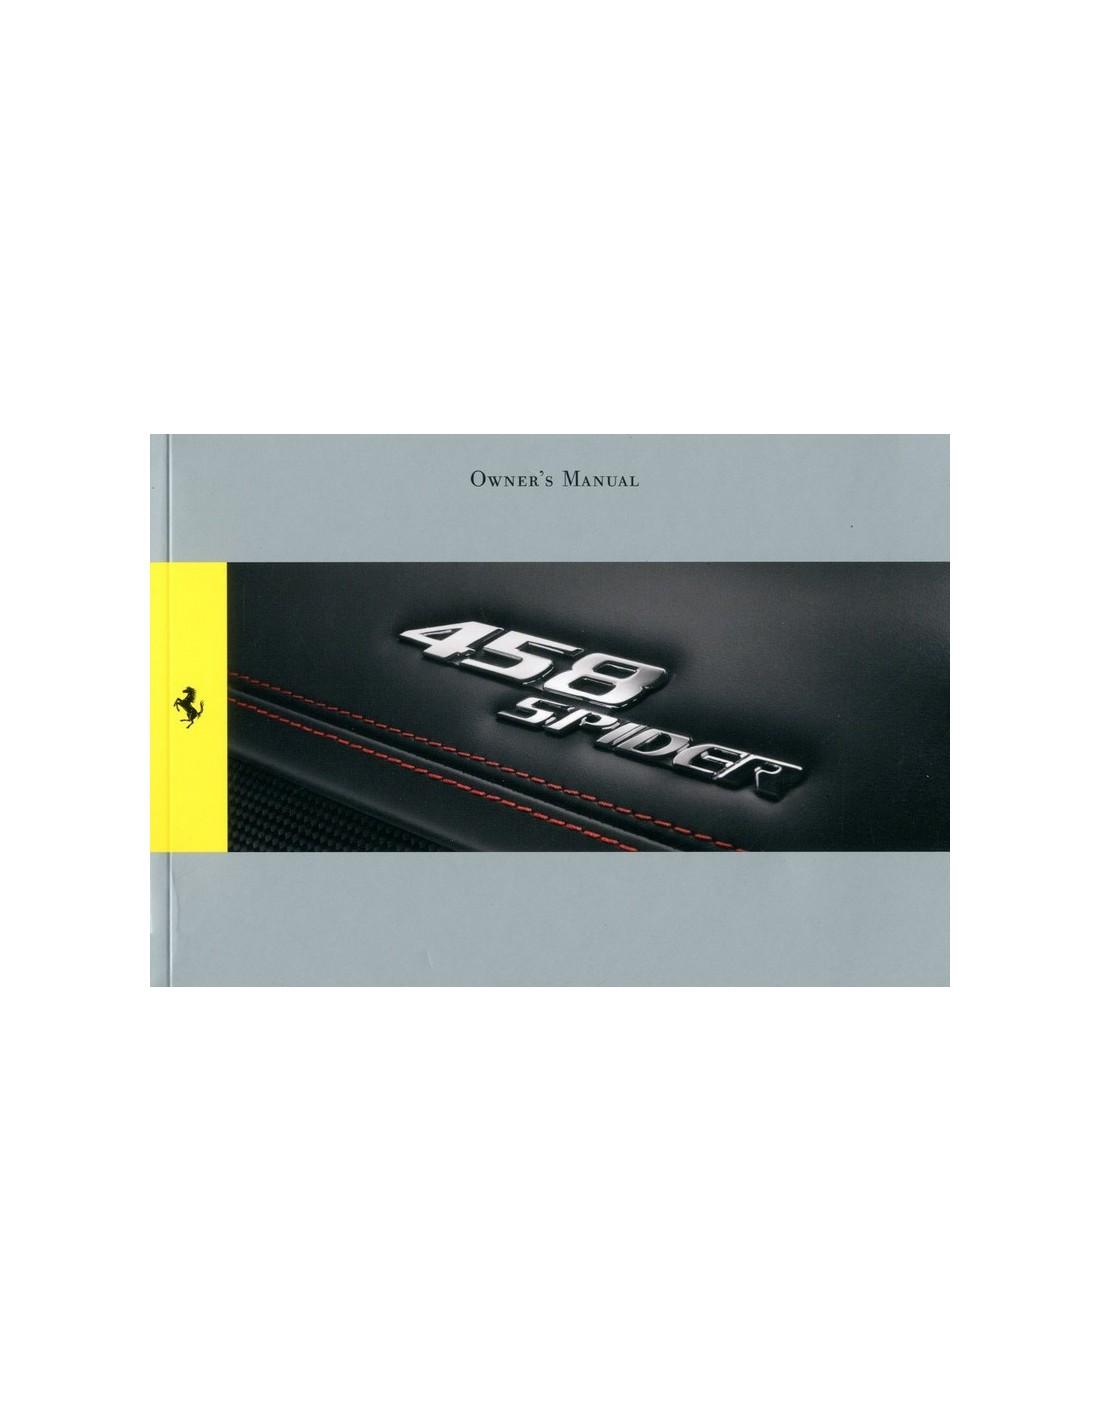 Ferrari Repair Manuals: 2011 FERRARI 458 SPIDER OWNER'S MANUAL 3849/11